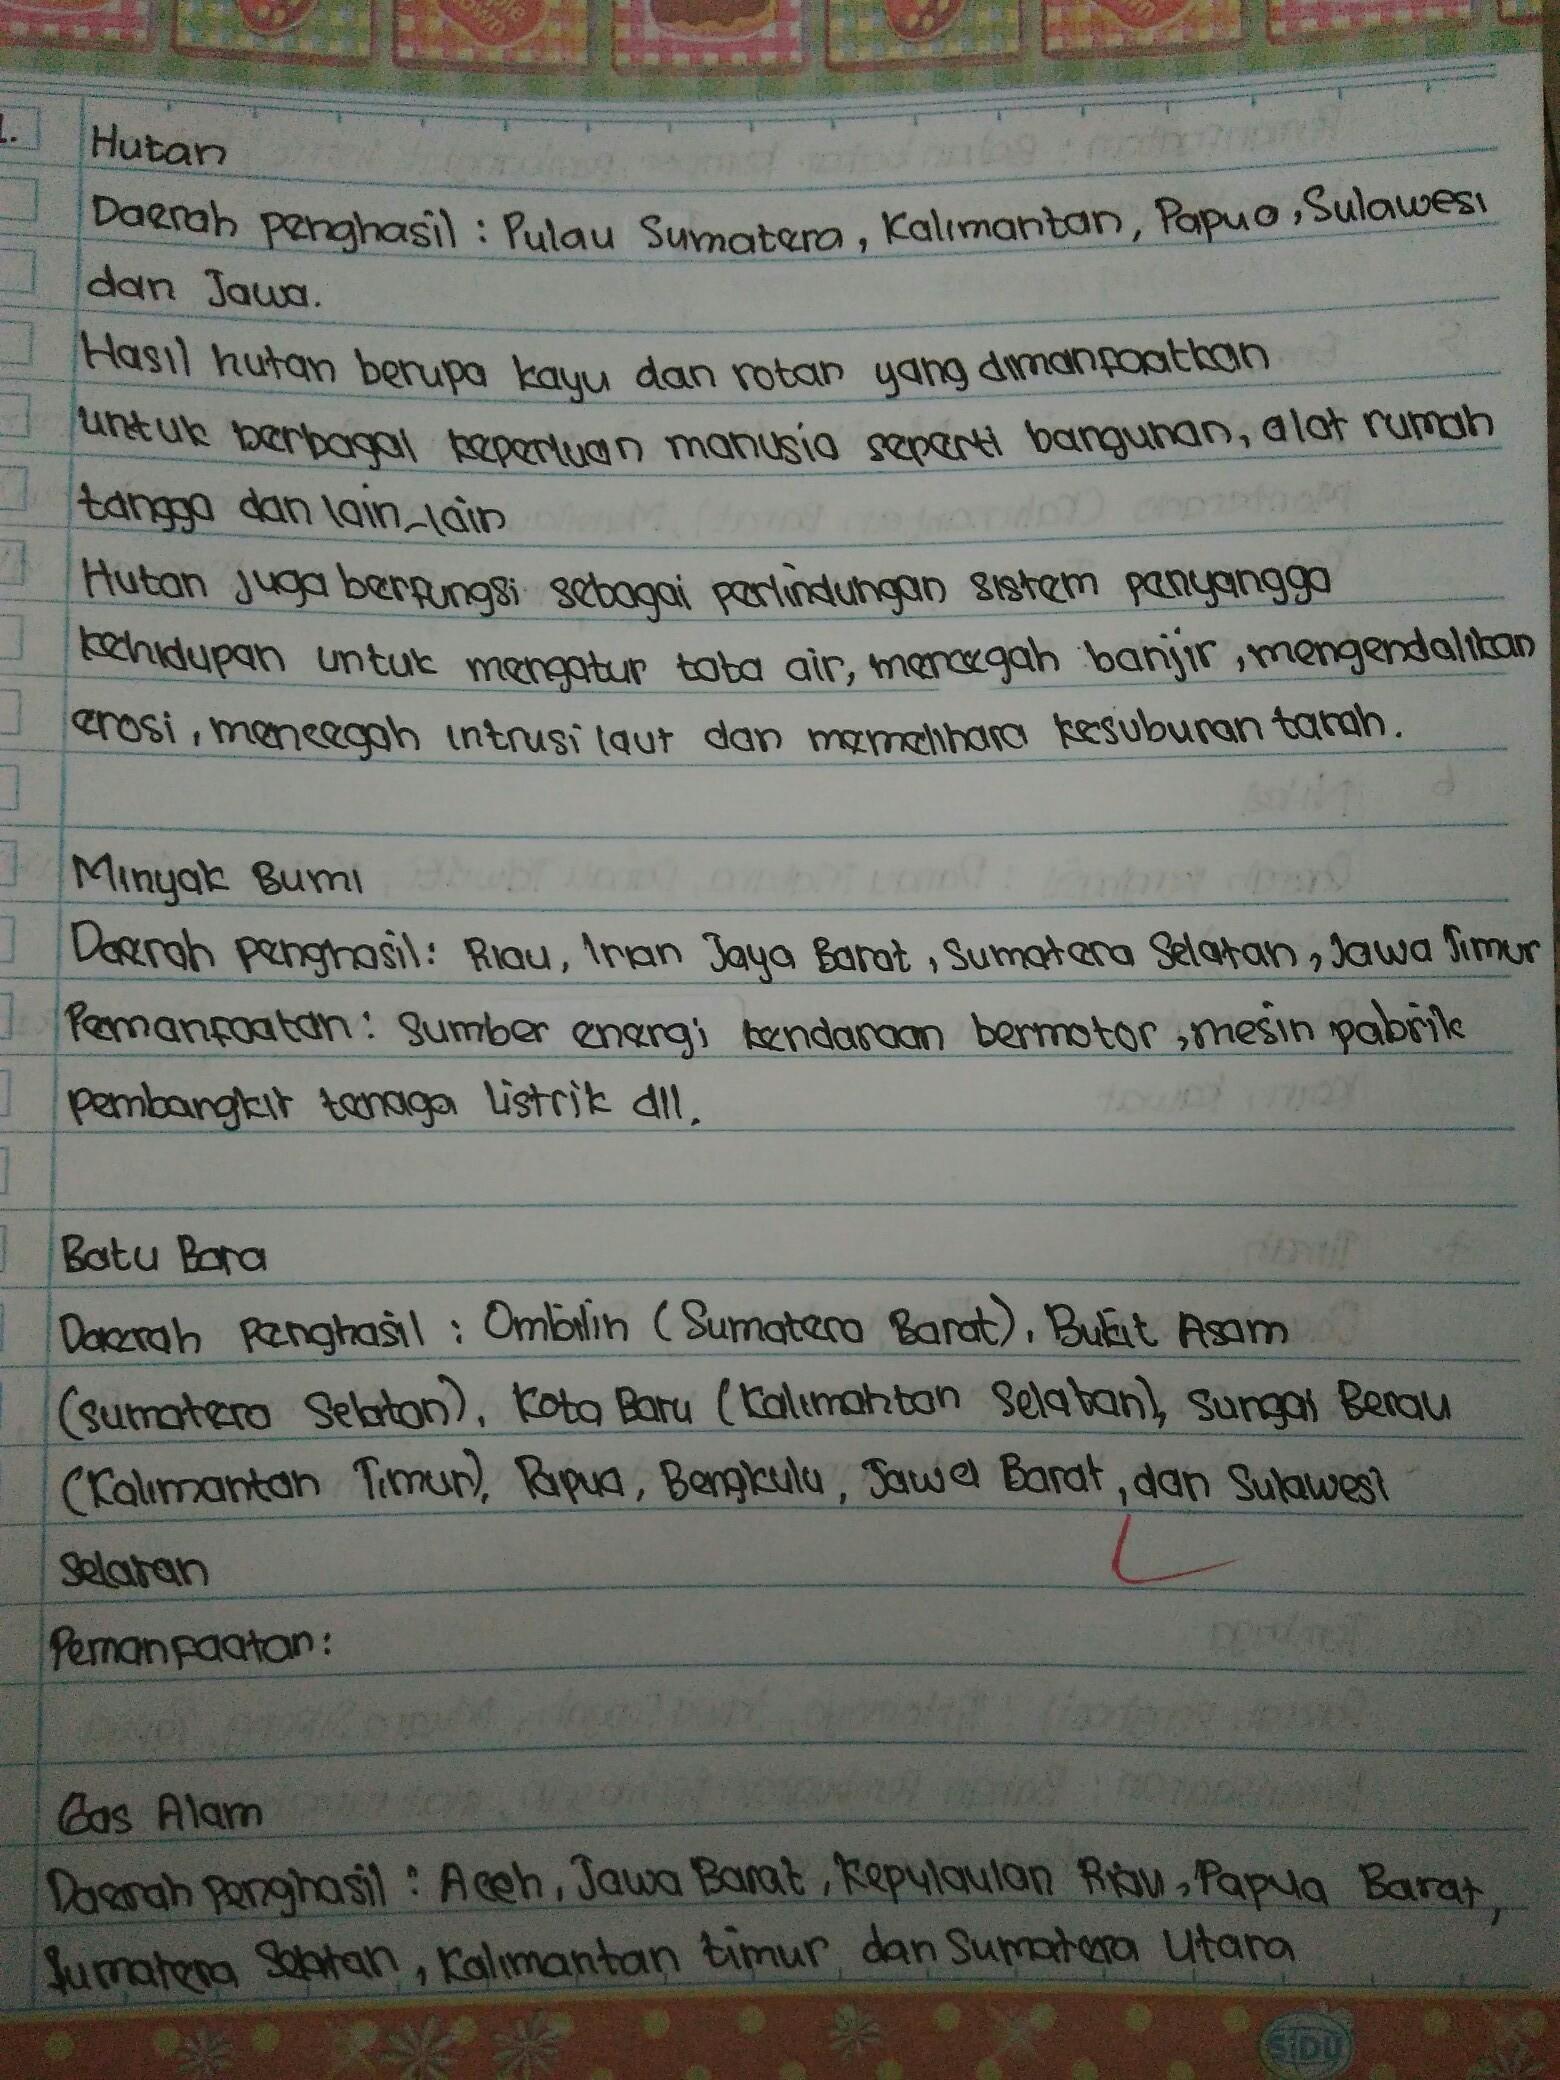 Daerah Penghasil Minyak Bumi Di Pulau Jawa : daerah, penghasil, minyak, pulau, Sebutkan, Daerah, Penghasil, Minyak